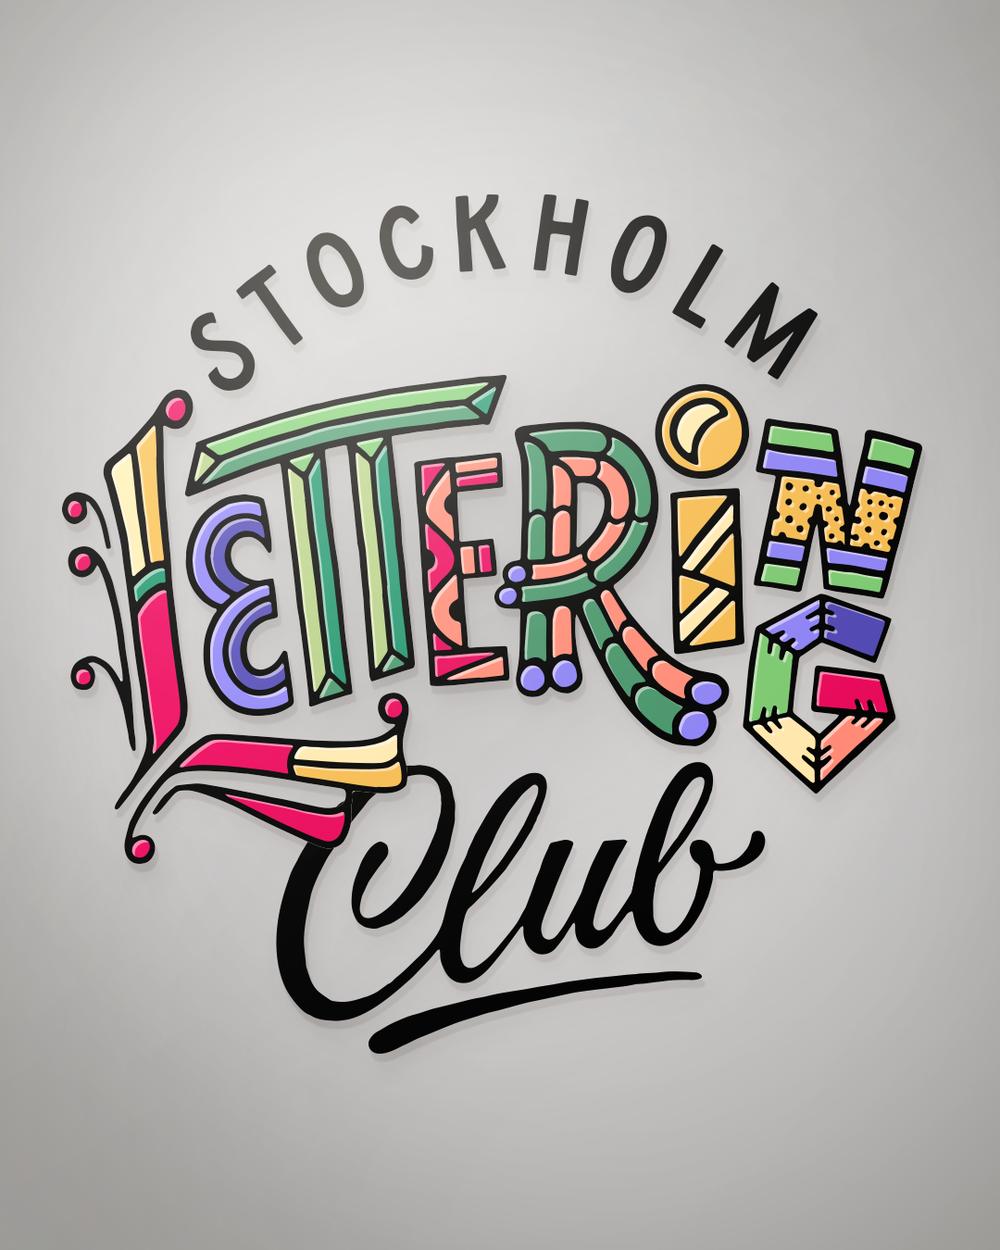 simonalander-slc-logo-instagram.png